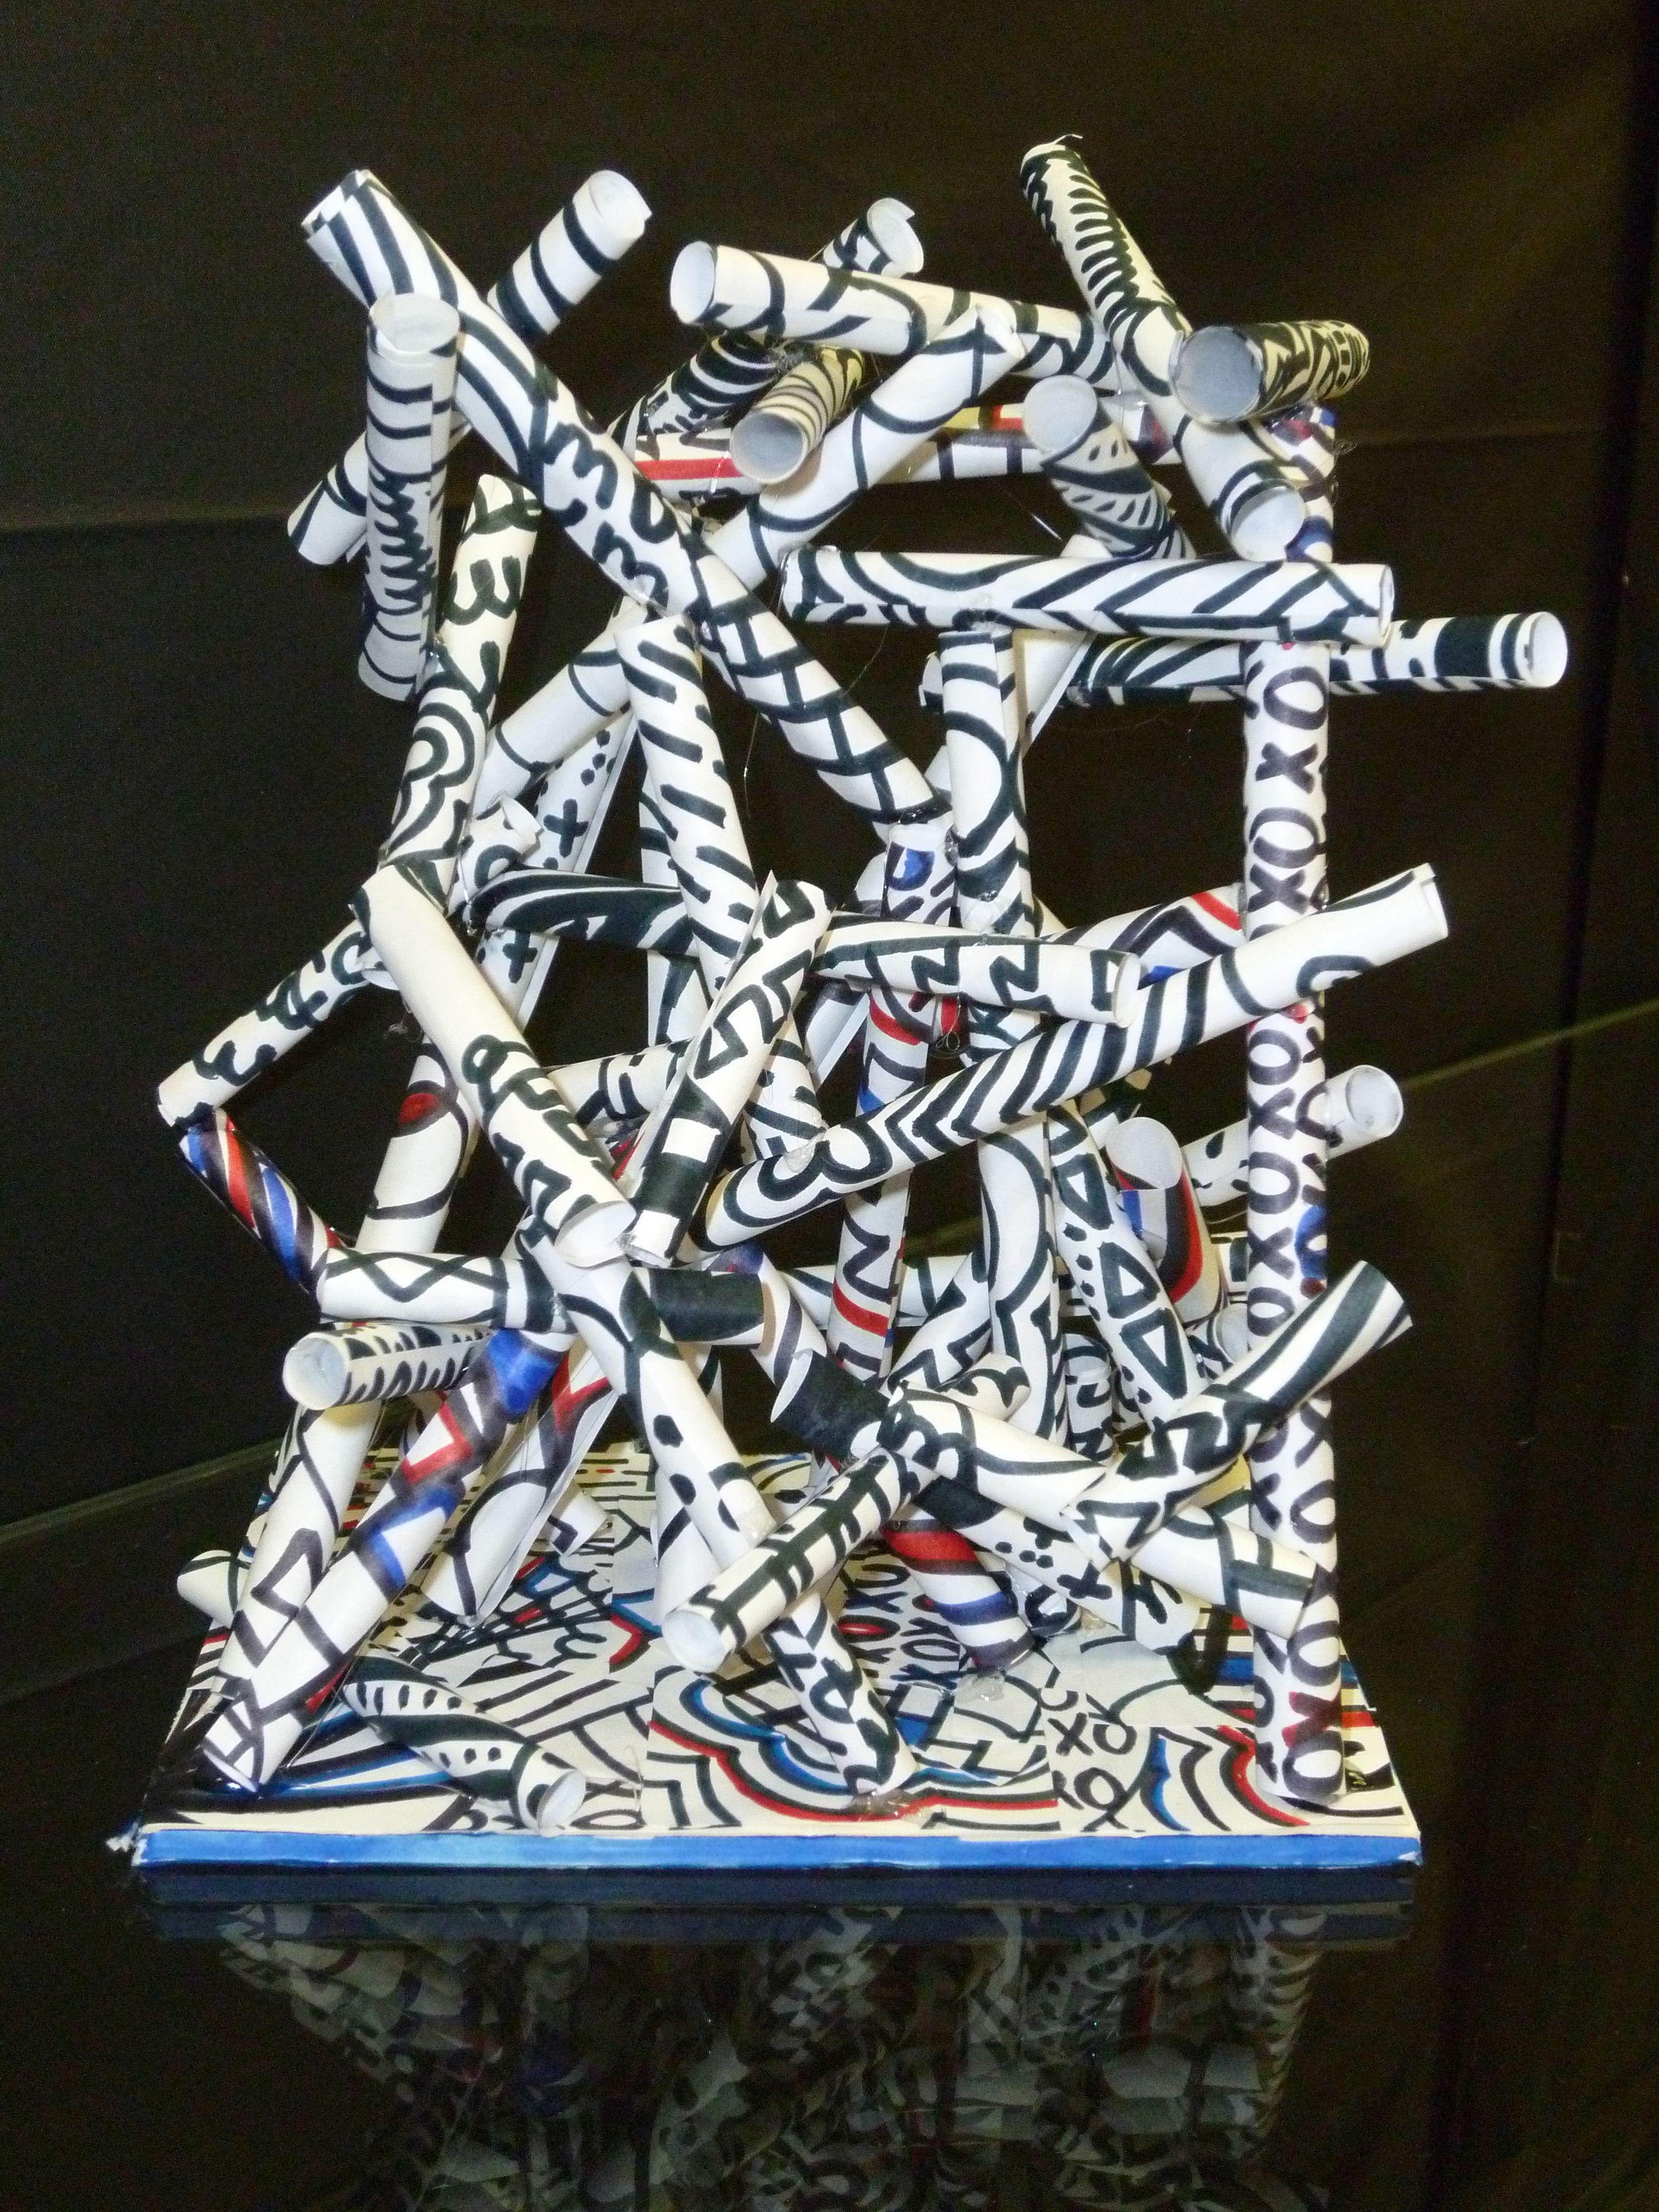 The Smartteacher Resource Debuffet Inspired Paper Sculptures